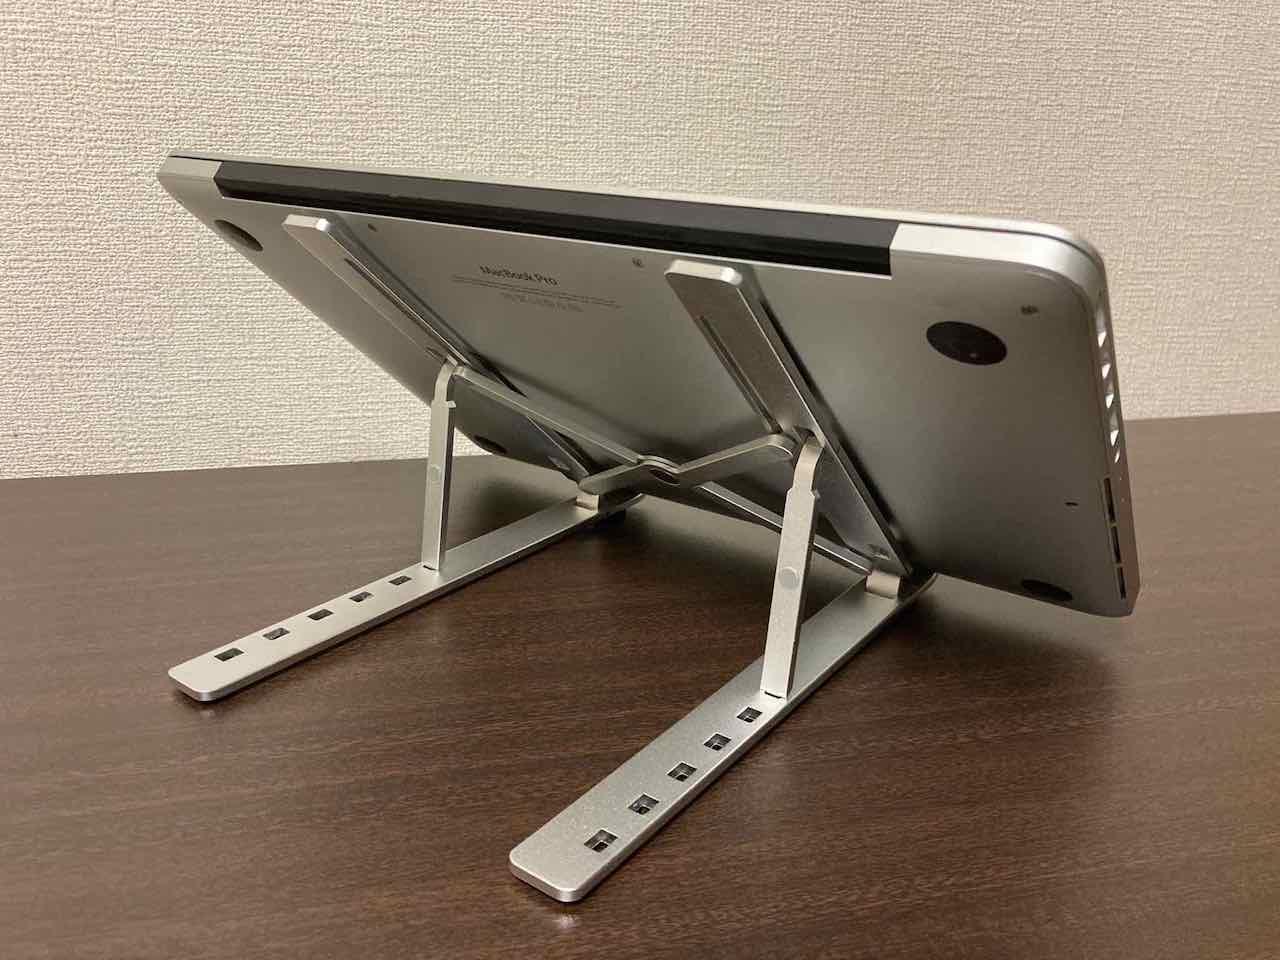 DODOLIVE 折りたたみ式 ノートパソコンスタンド